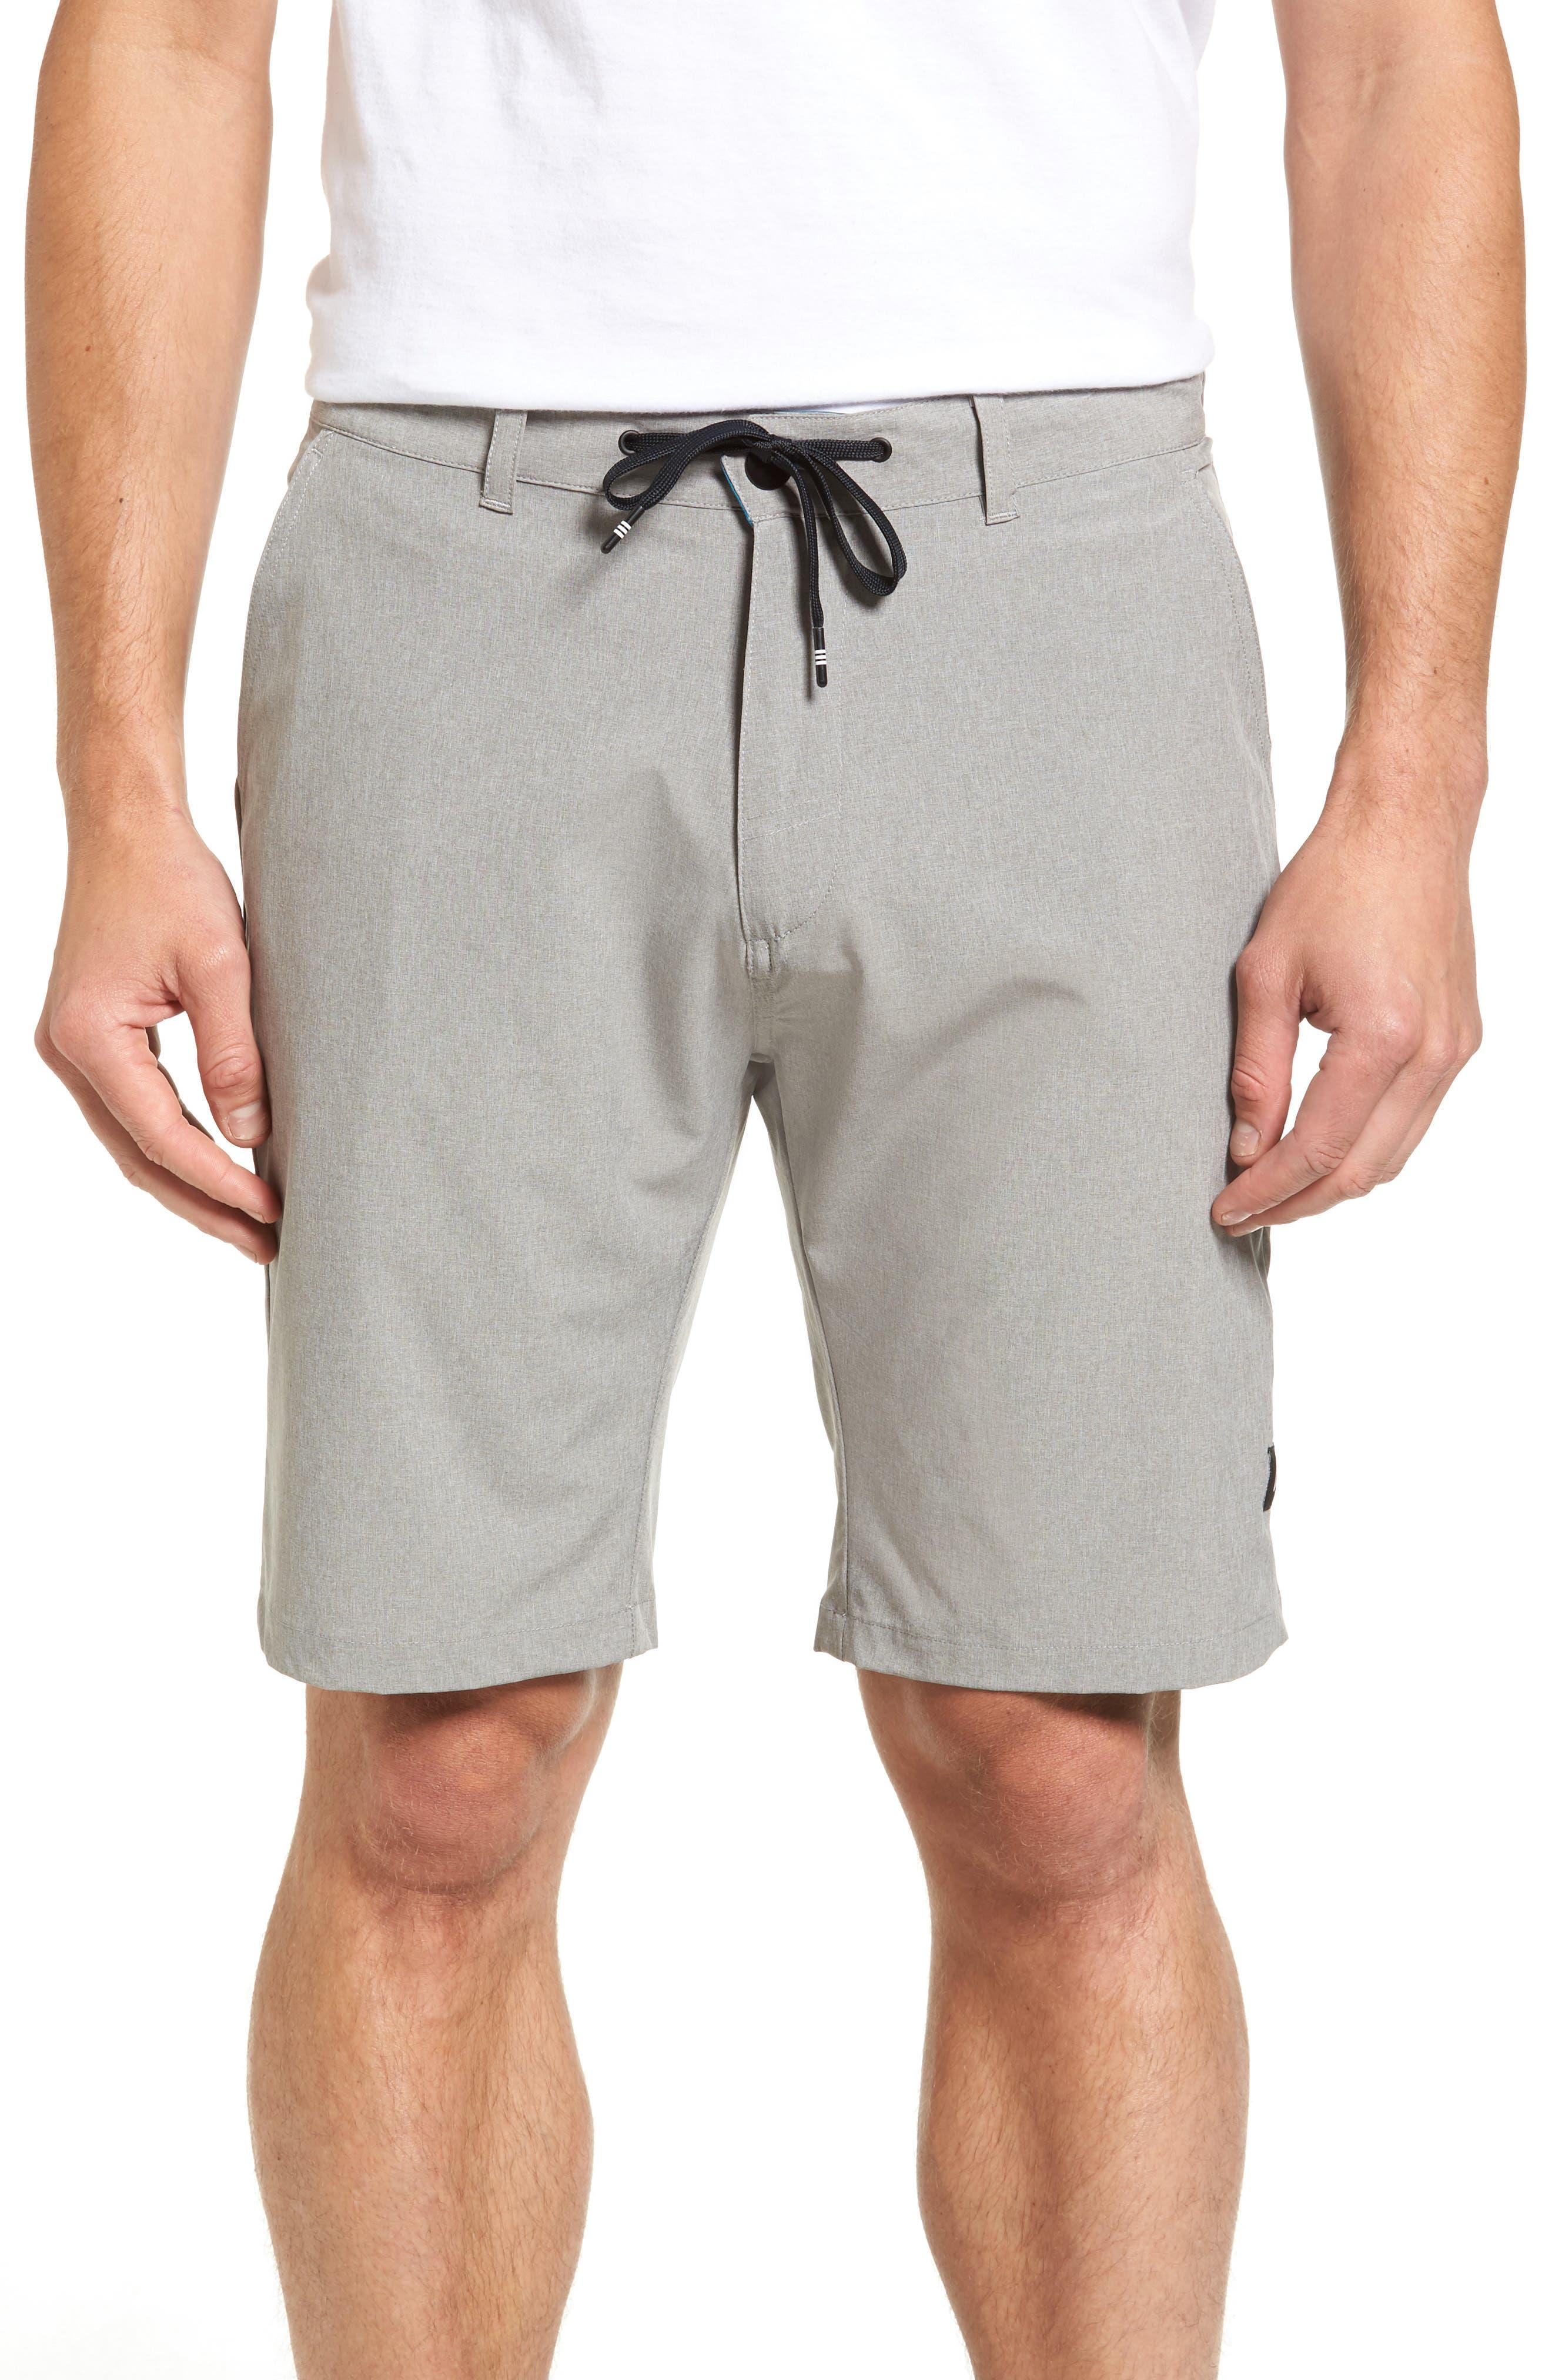 Freedom Carbon Cruiser Shorts,                         Main,                         color, Grey